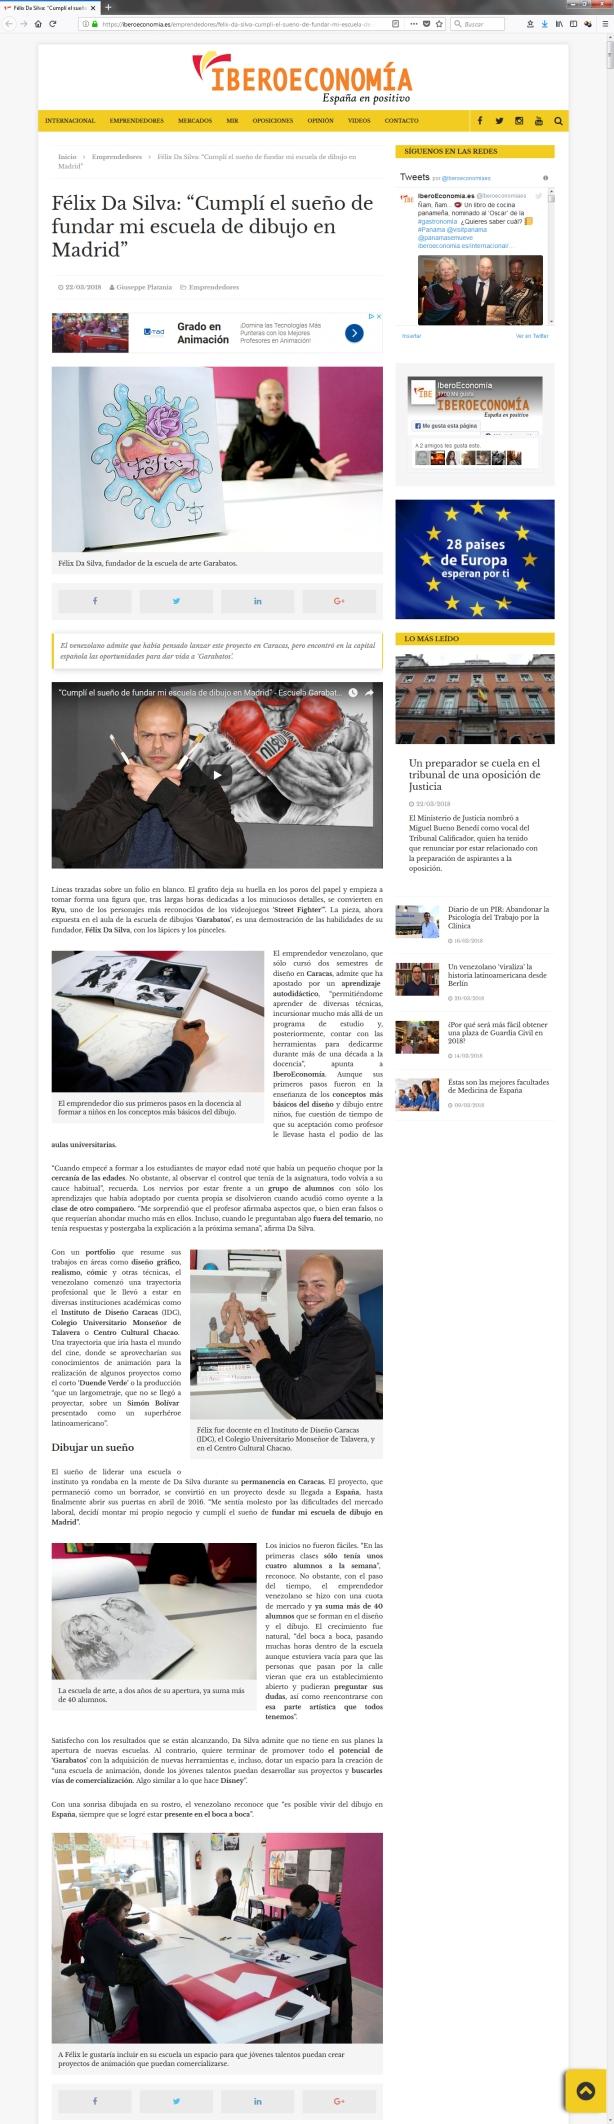 Entrevista Completa Web